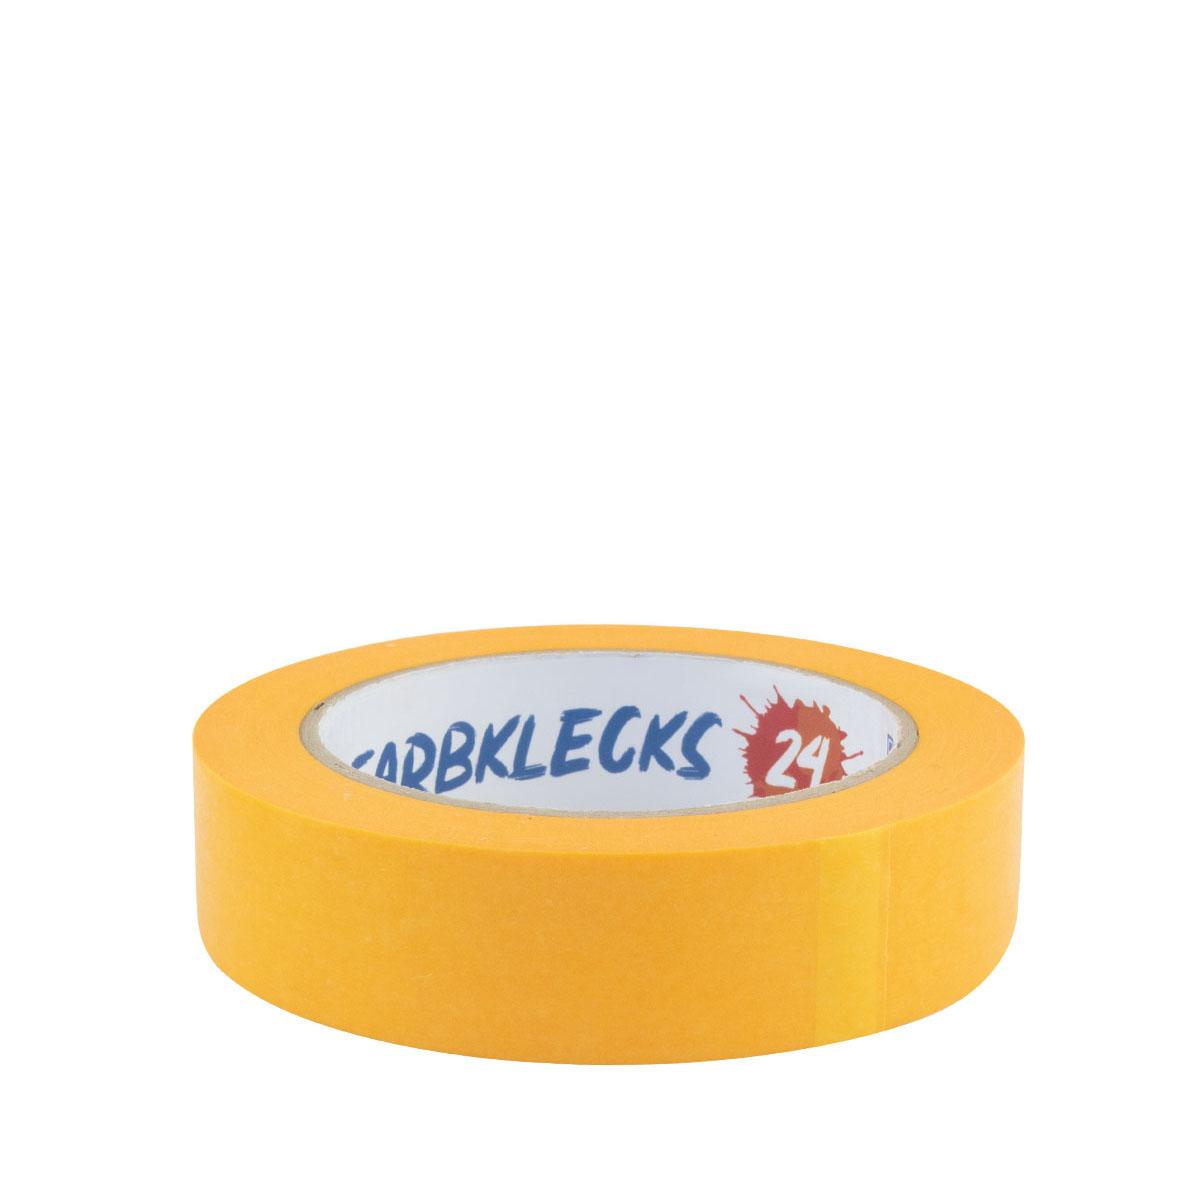 Farbklecks24 Klebeband Gold, Goldband 25mm